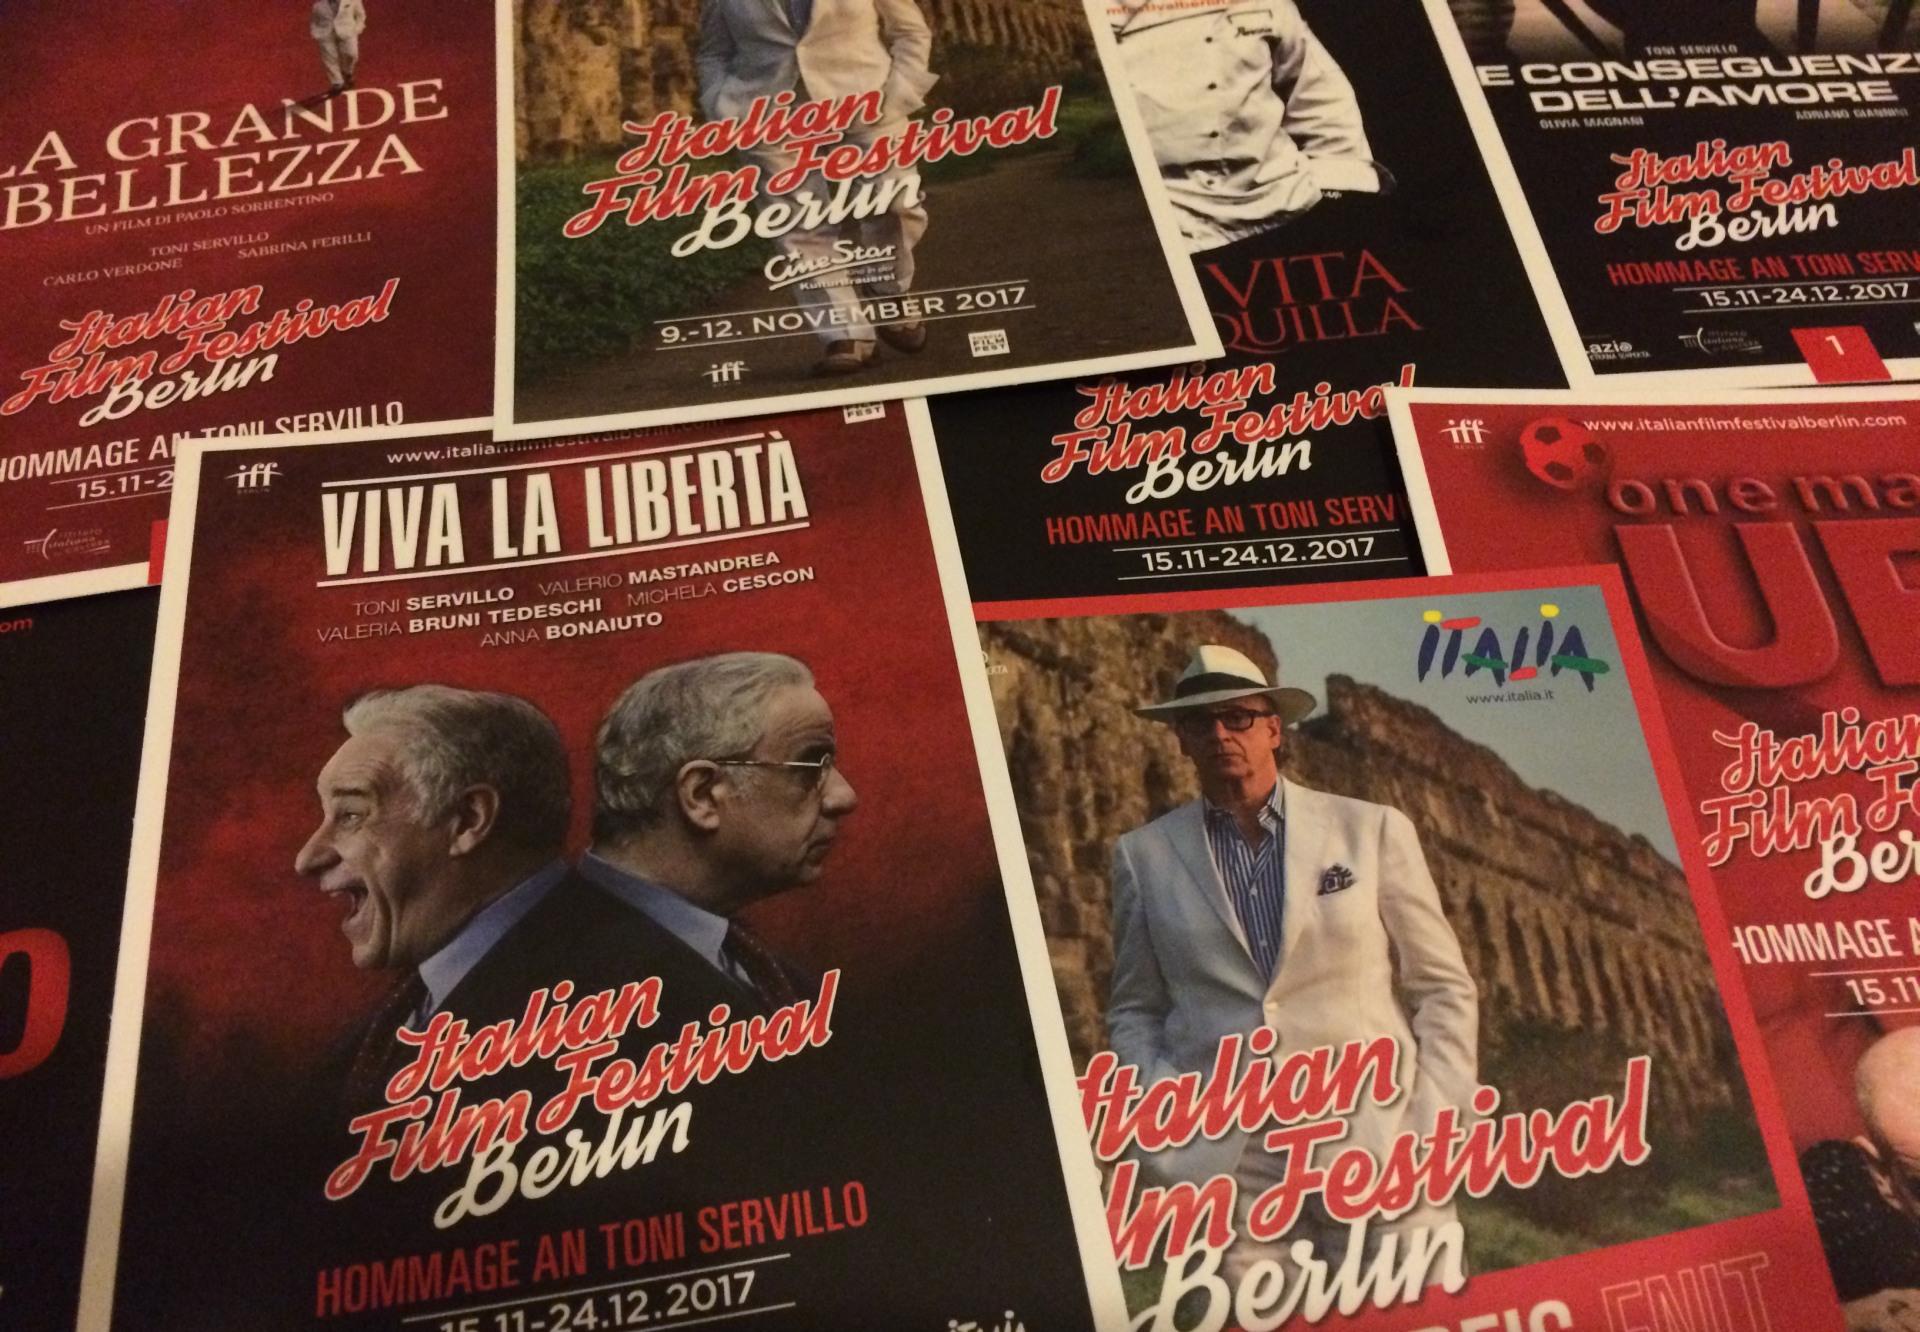 Italienisches Filmfestival Berlin 2017